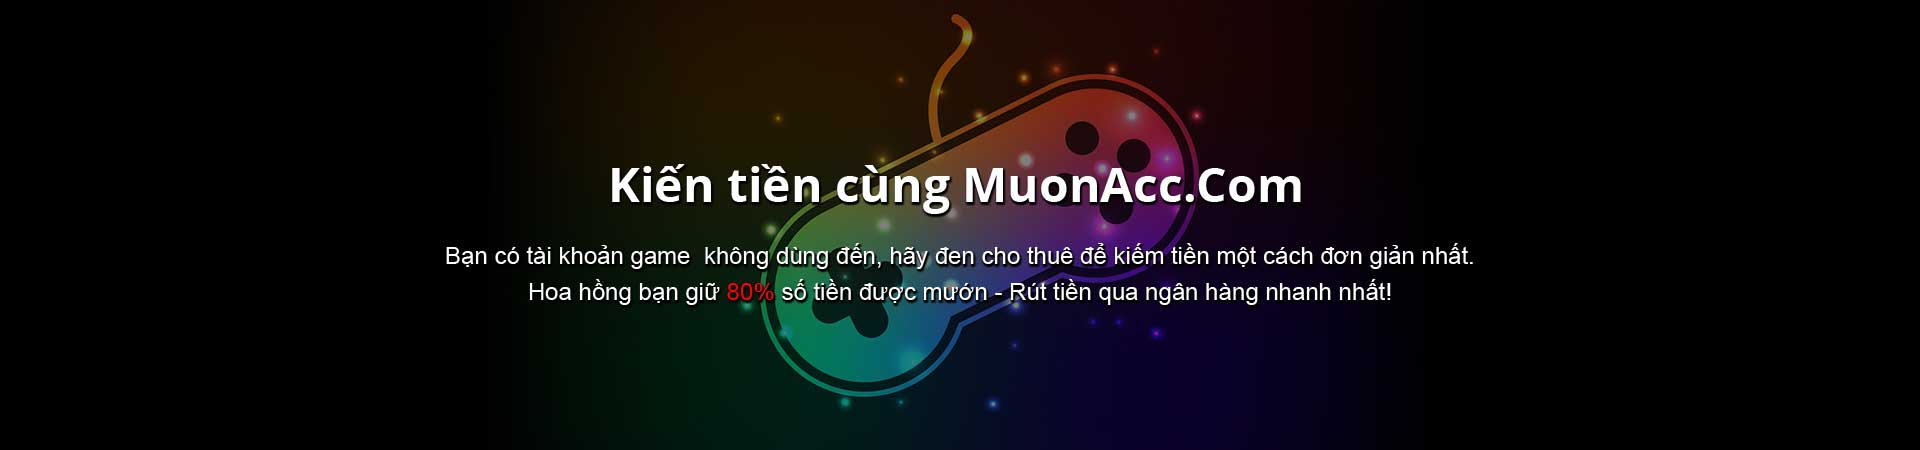 Kiếm tiền cùng MuonAcc.Com